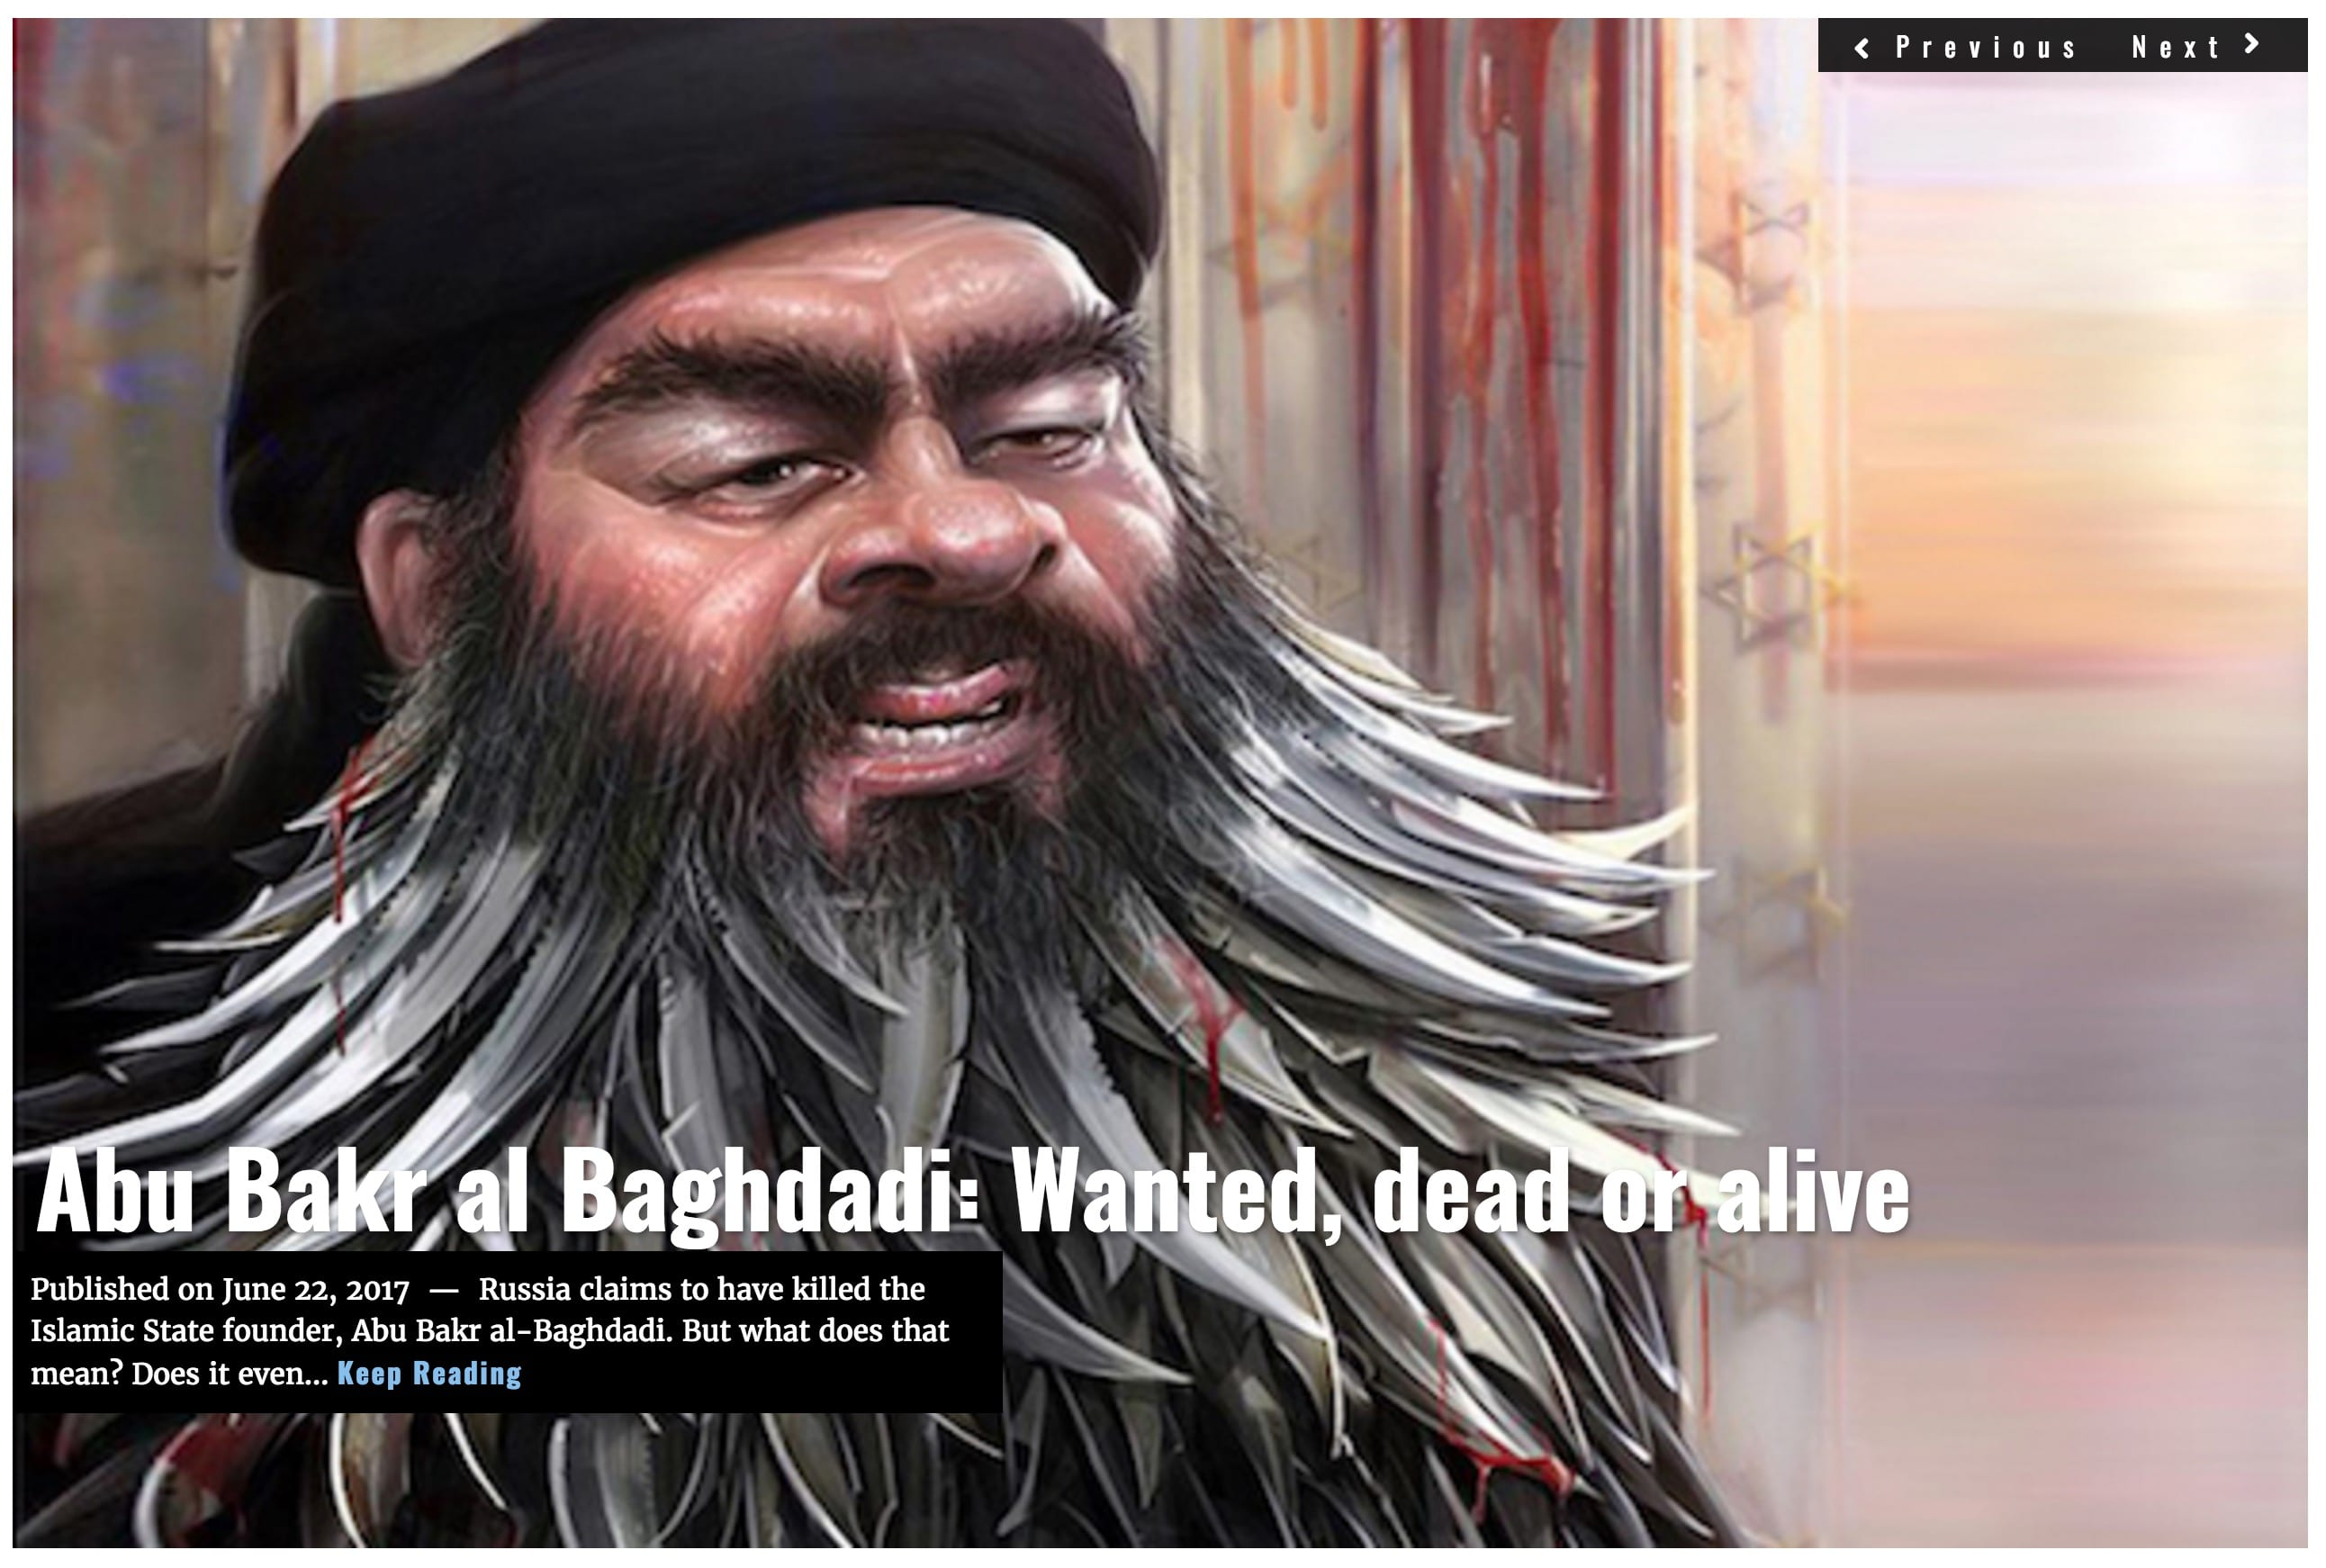 Image Lima Charlie News Headline al Baghdadi JUN22 J.Sjoholm